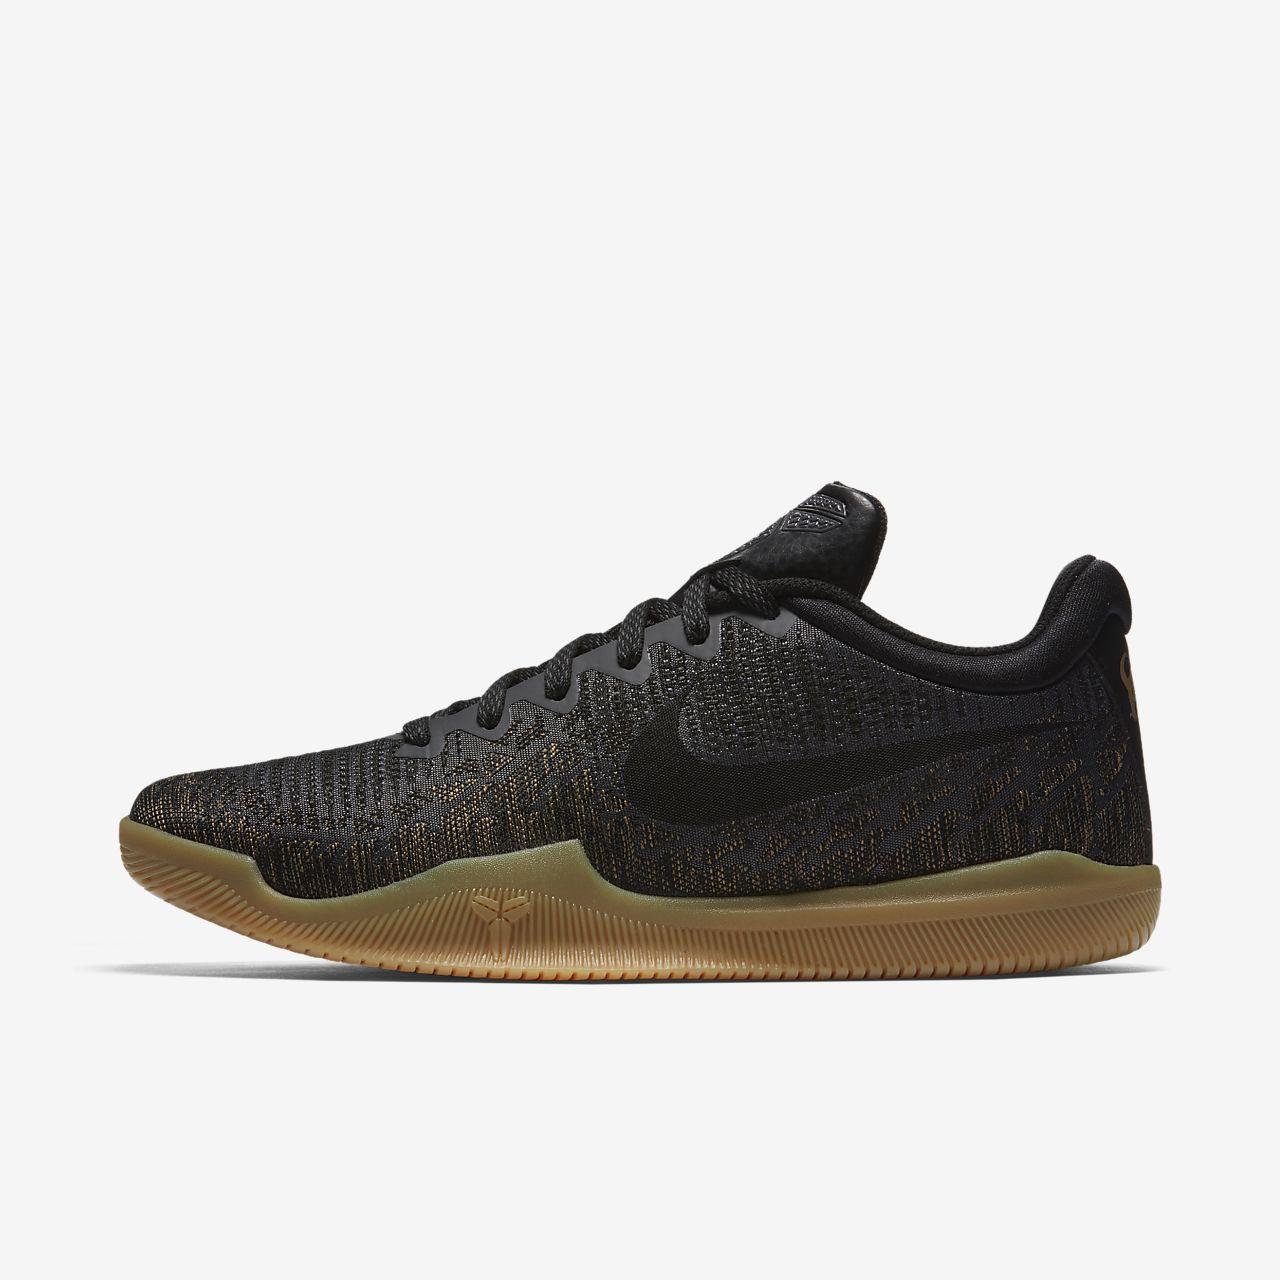 Nike Mamba Rage Premium Dark Grey Sequoia Gum Light Brown Black AJ7281020